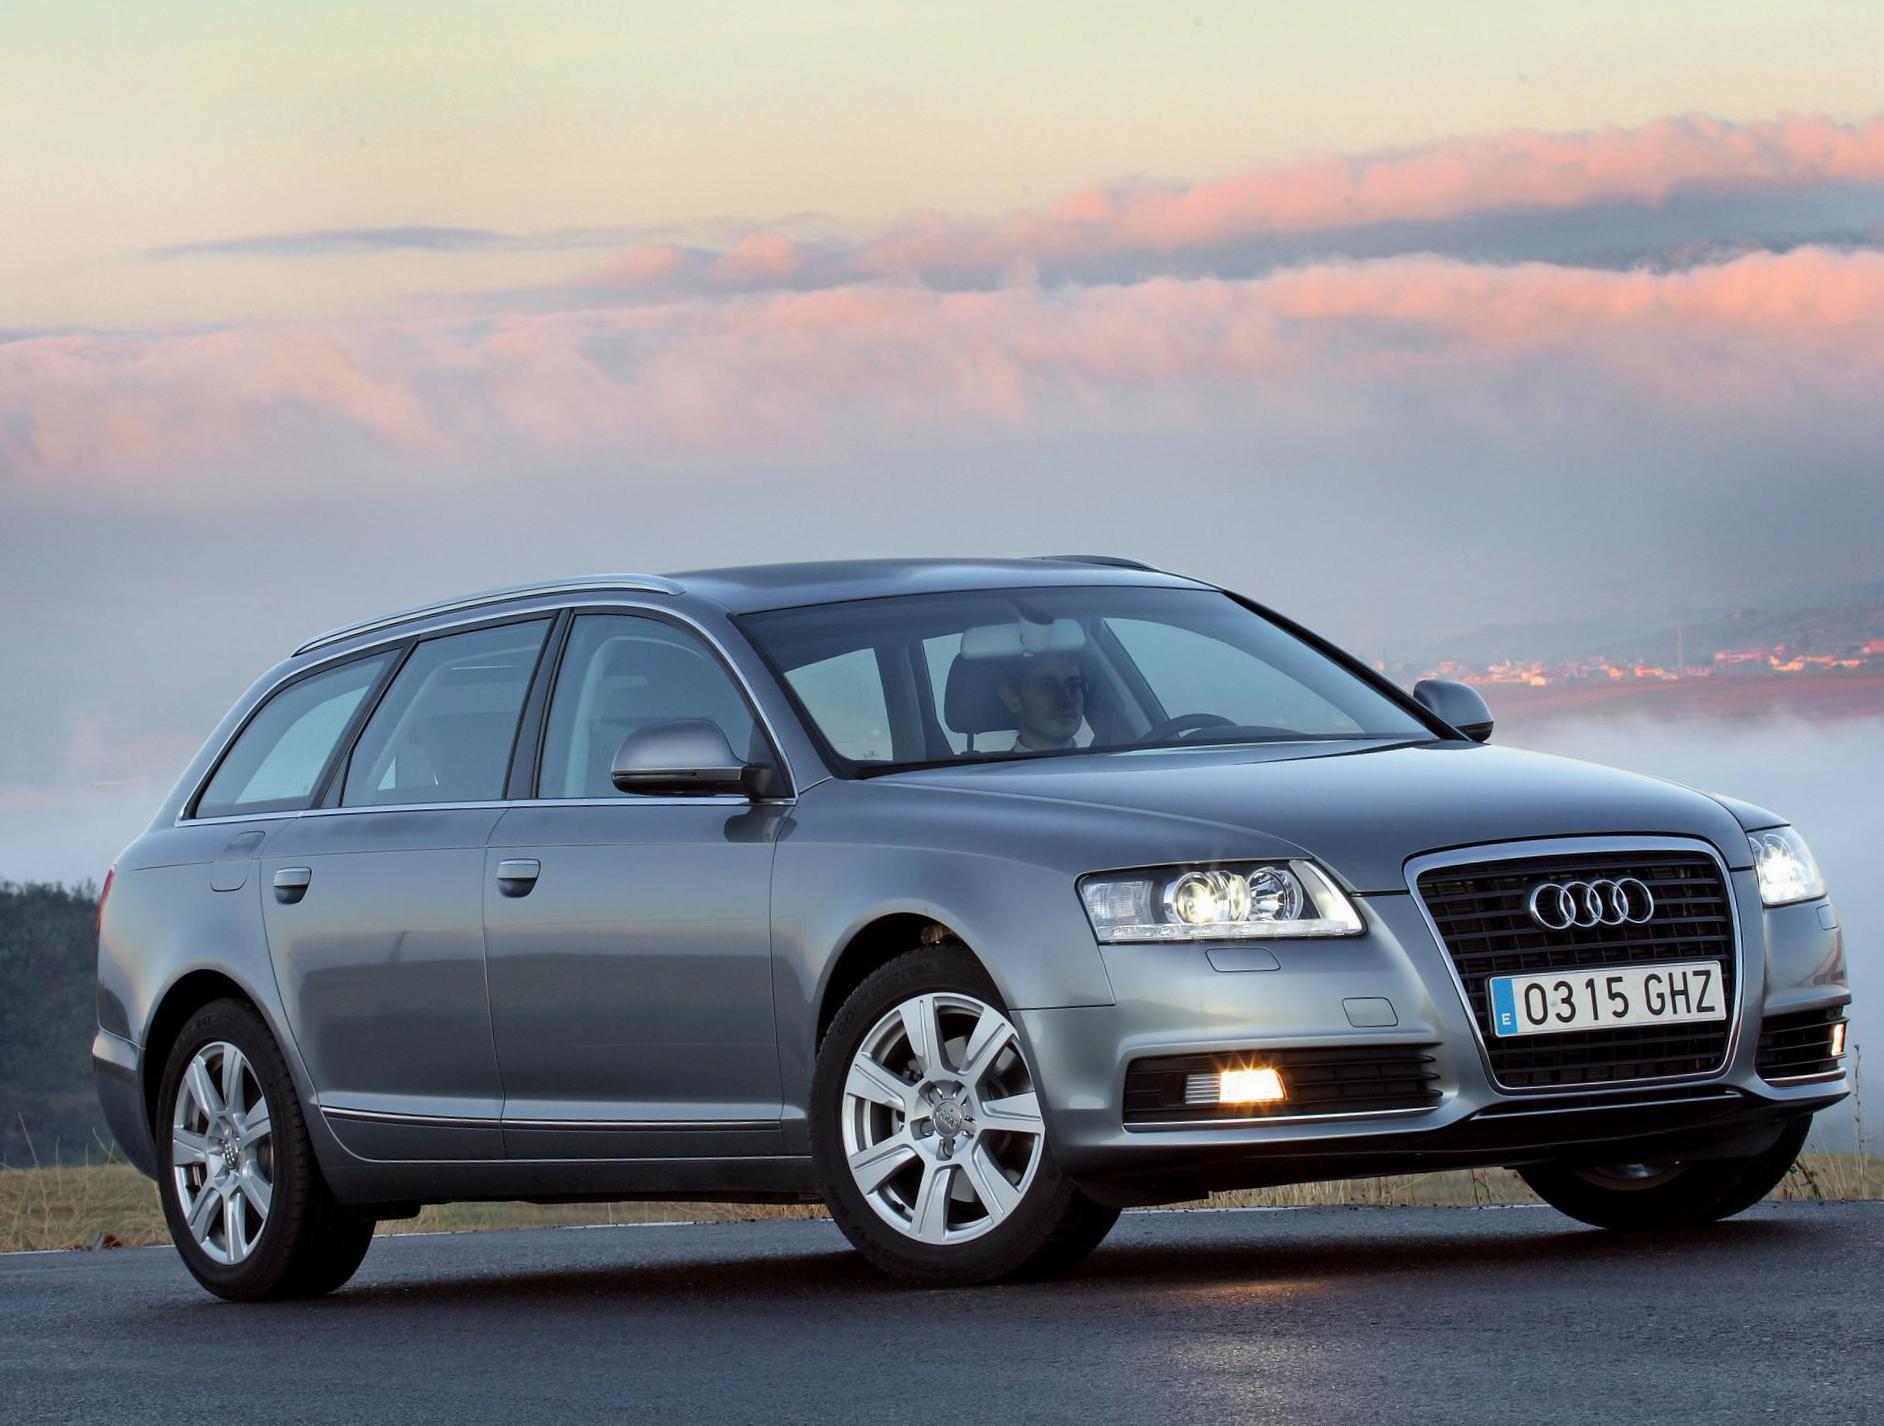 Настройка функций наружного освещения на Audi А6 С6